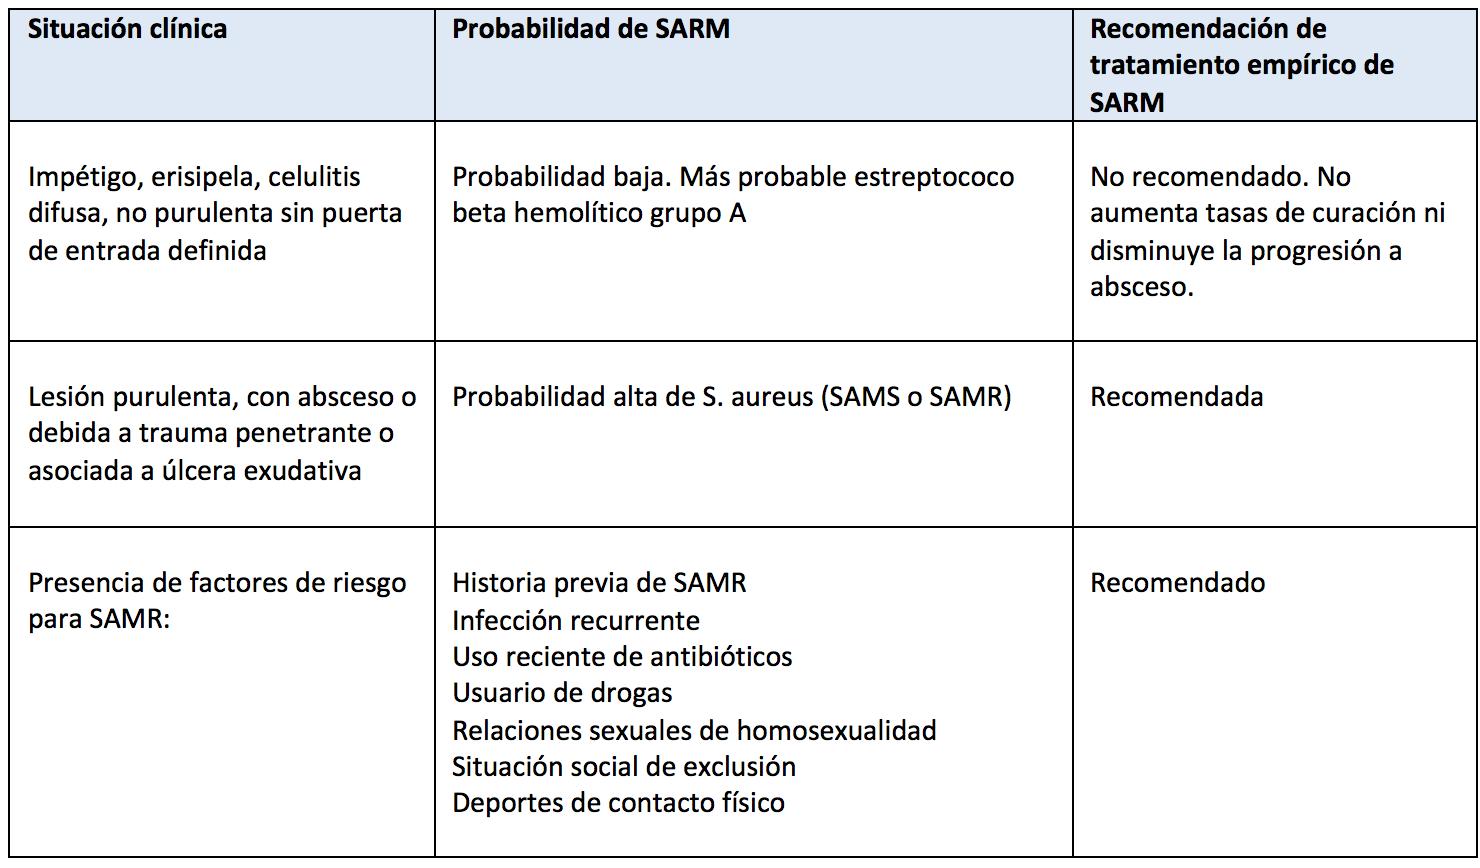 antibiótico por semana para evitar la recurrencia de la prostatitis